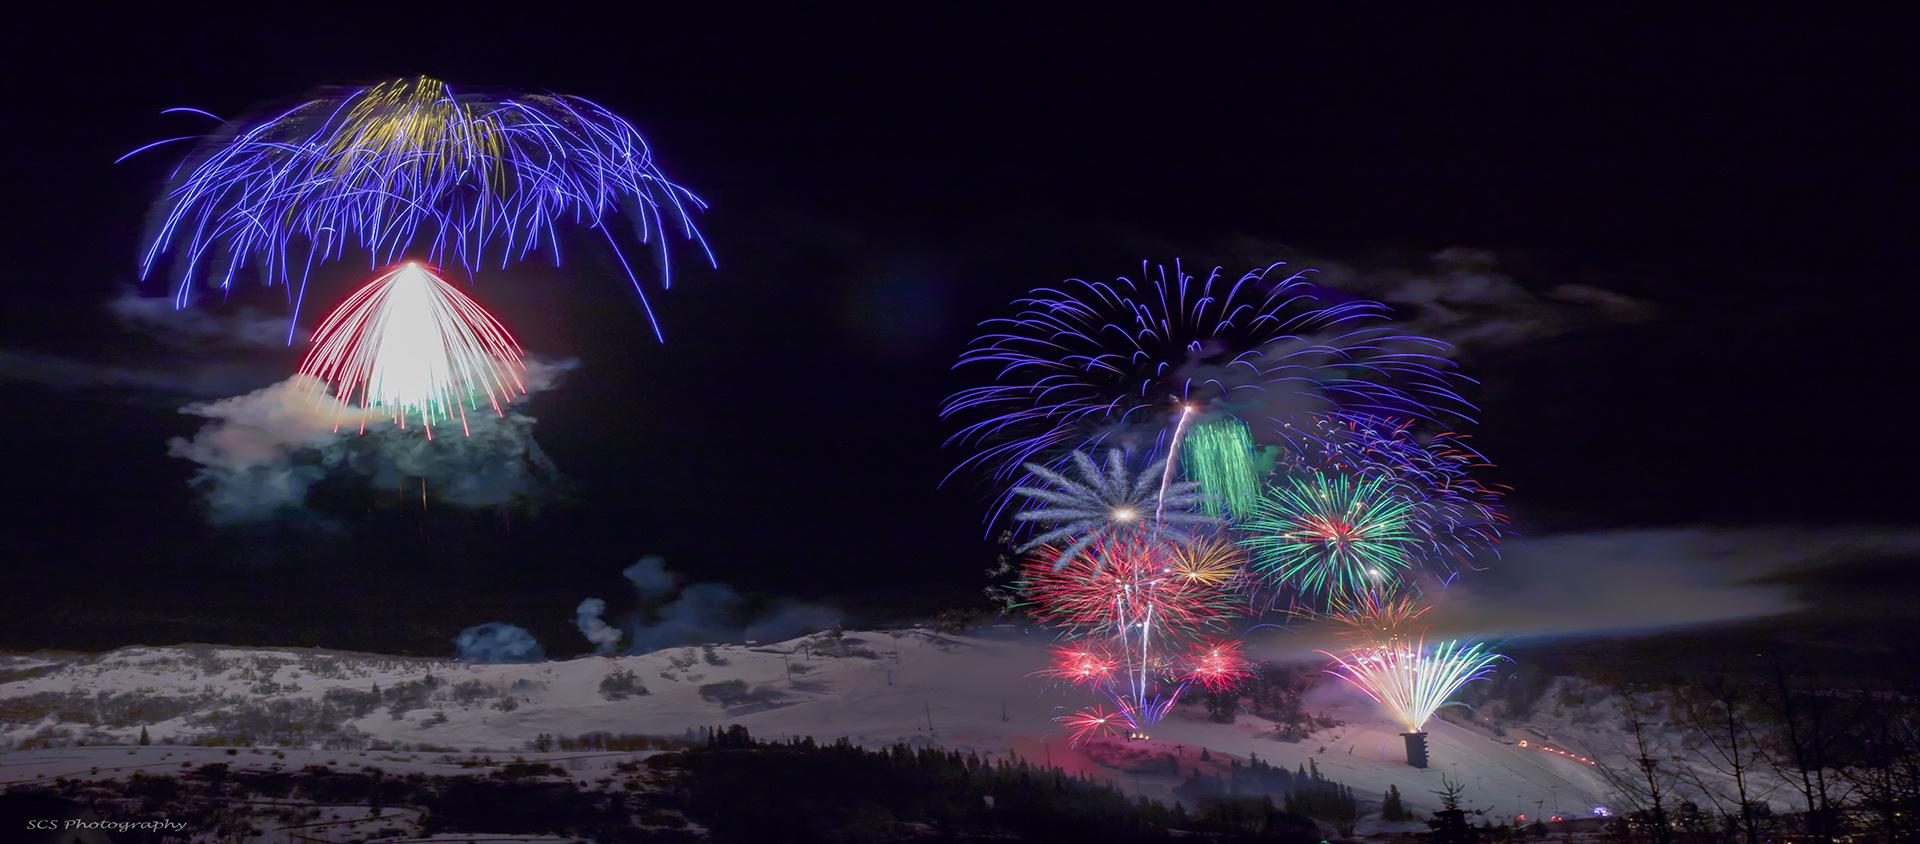 https://www.yvea.com/sites/yvea/files/revslider/image/fireworks%20layered%20with%20water%20mark.jpg